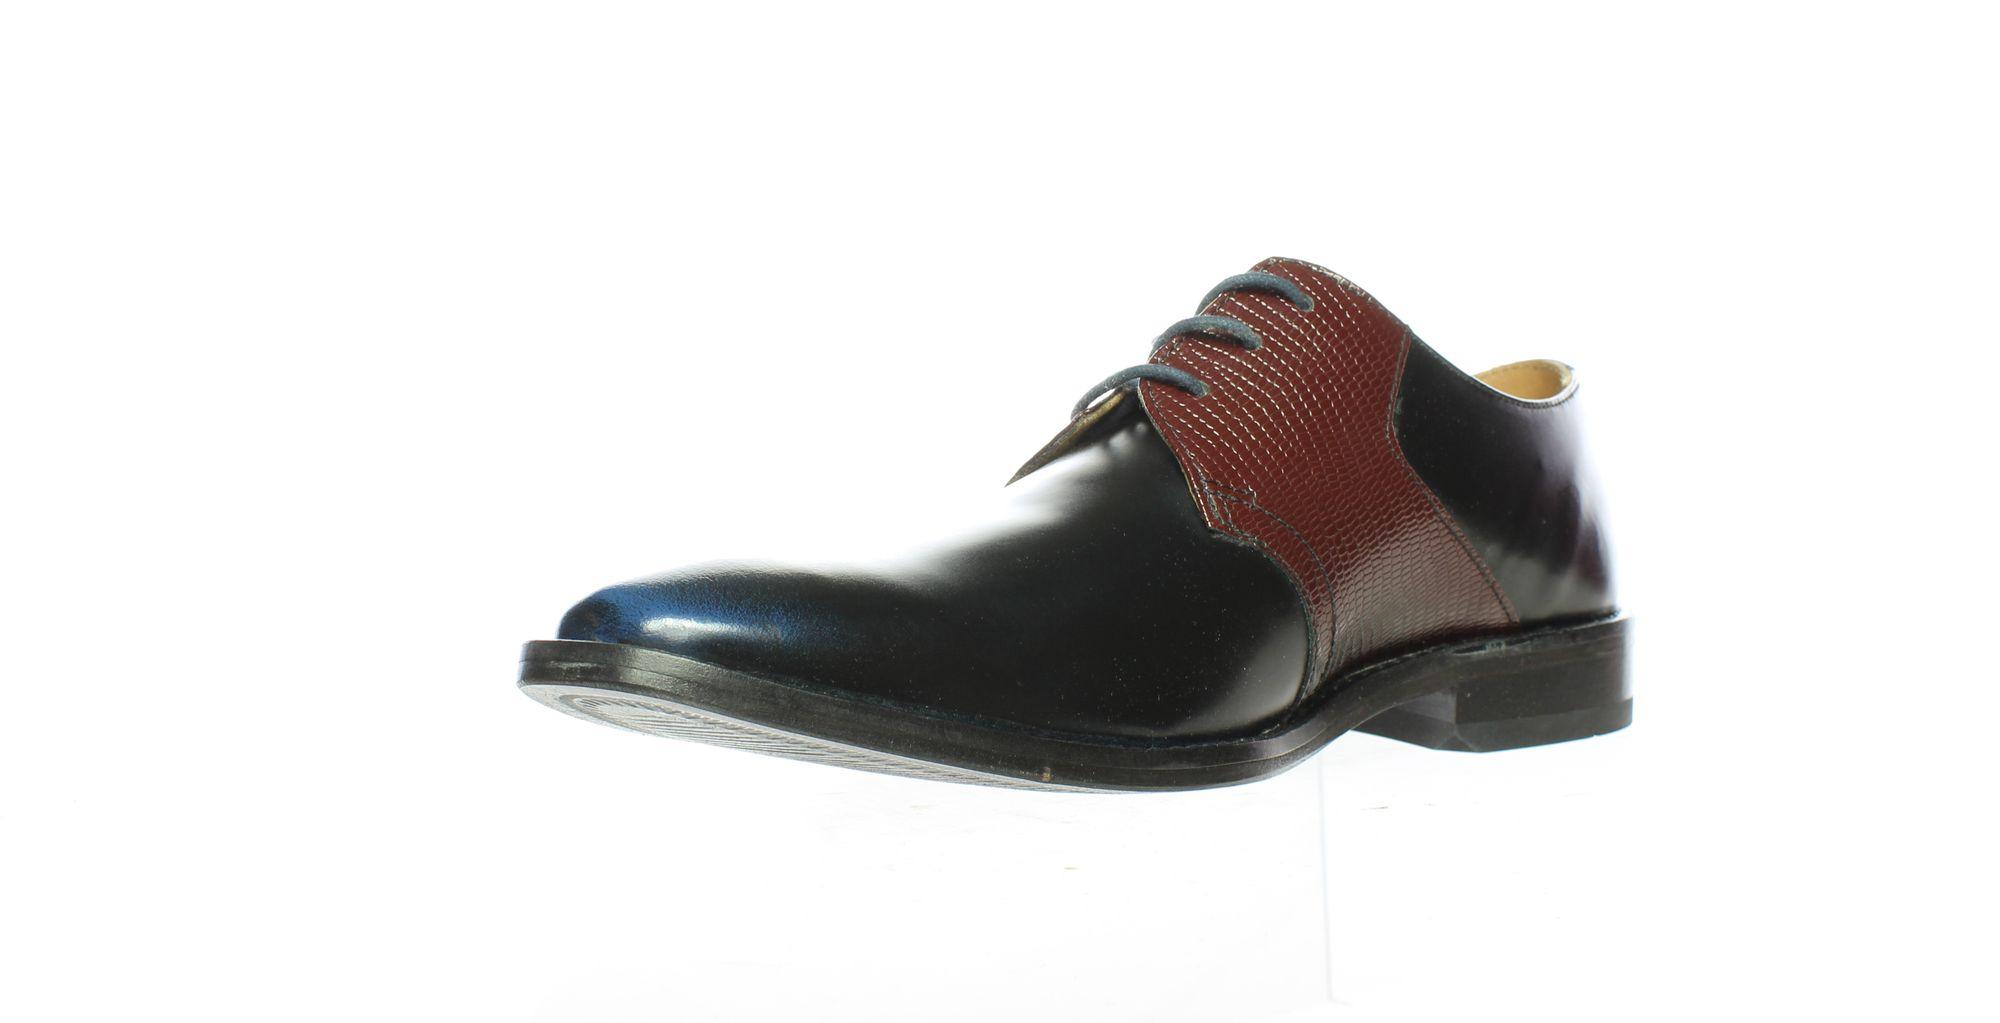 789156 Giorgio Brutini Mens Gotham Bordo//Navy Oxford Dress Shoe Size 8